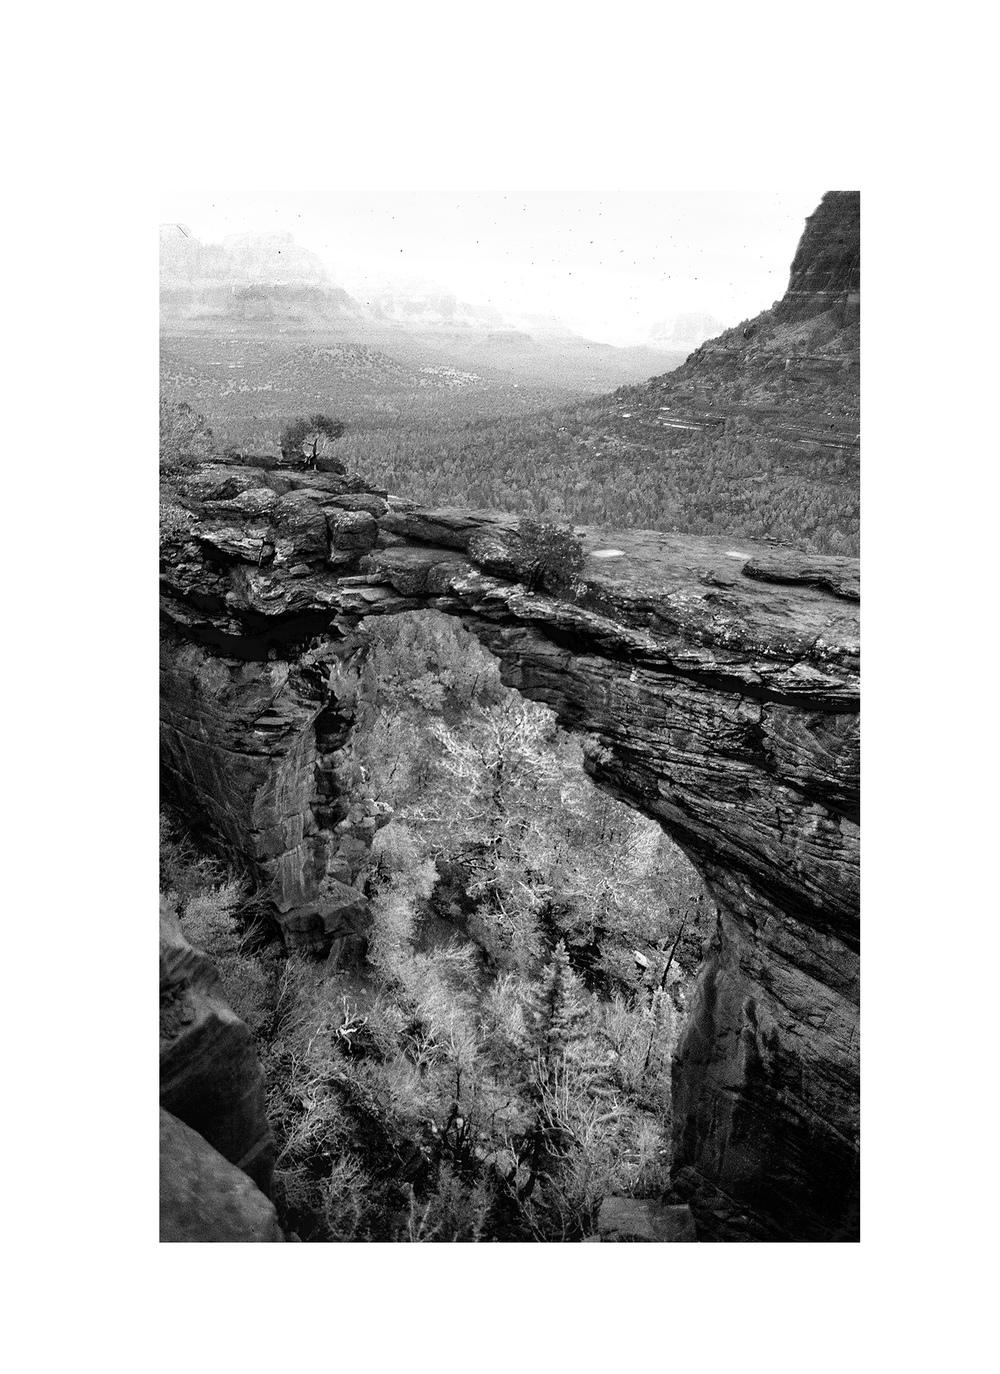 Matusik Travel-Nature 0020